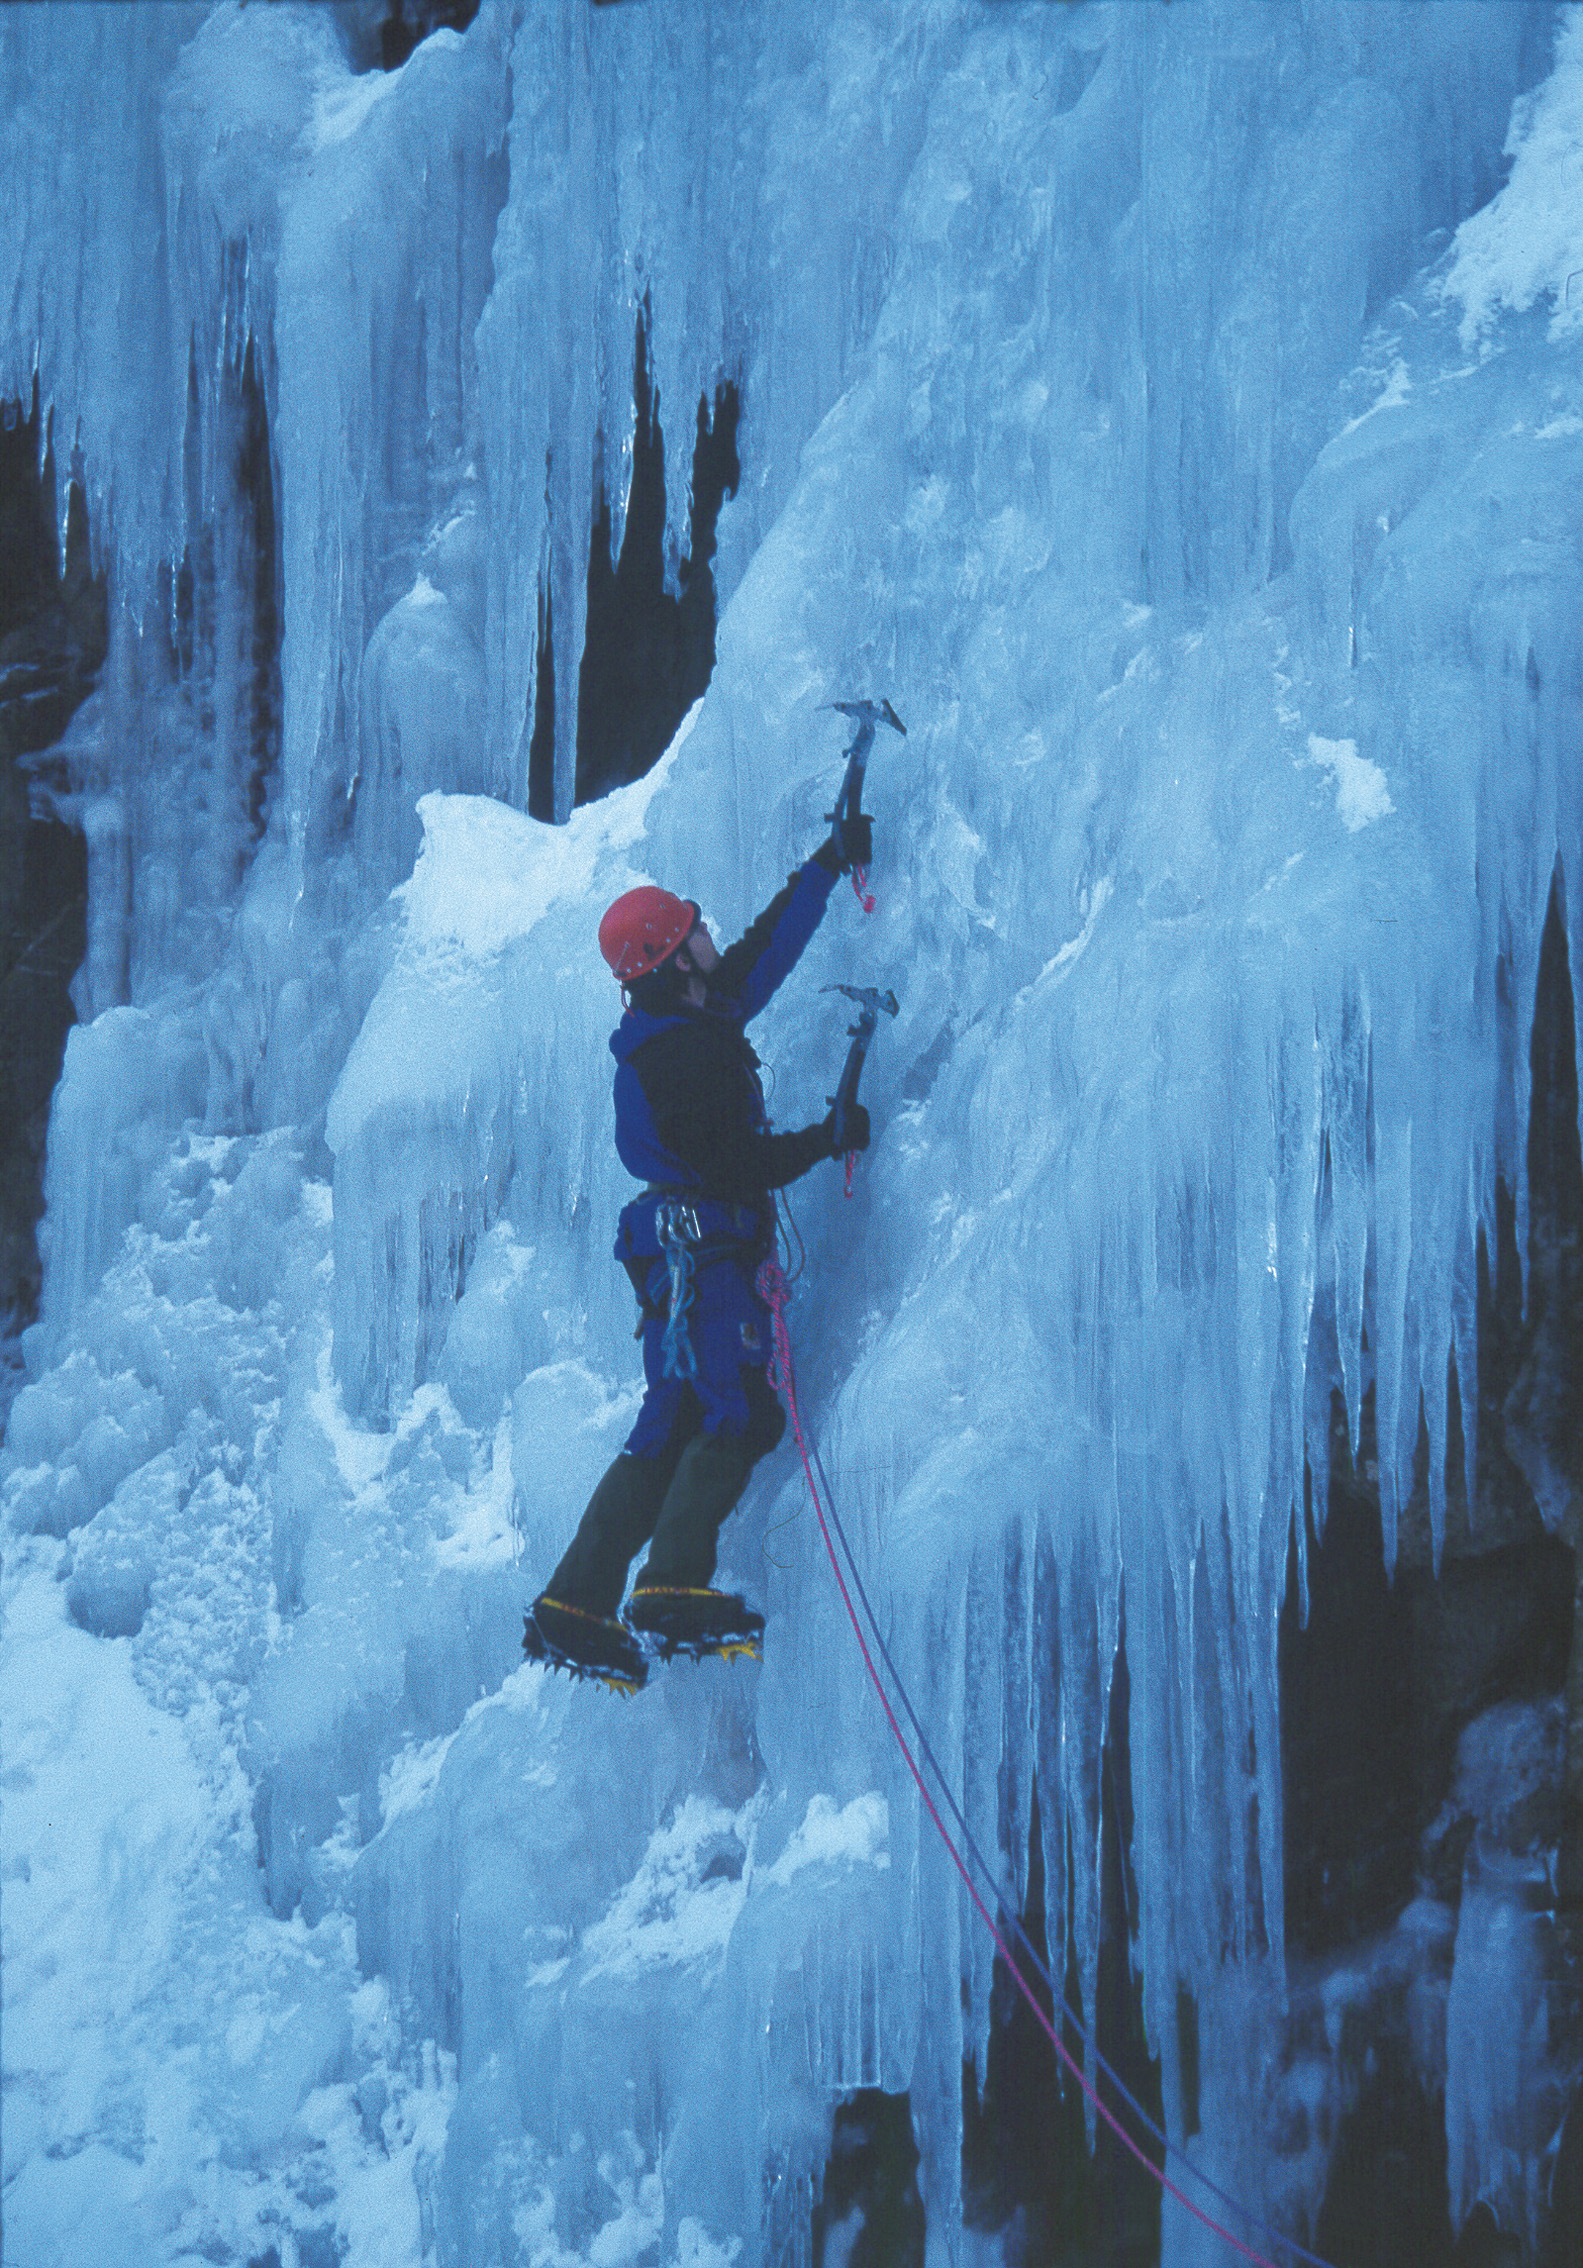 Rjukan arrangerer årlig en isklatrefestival. , © Jarle Andersen